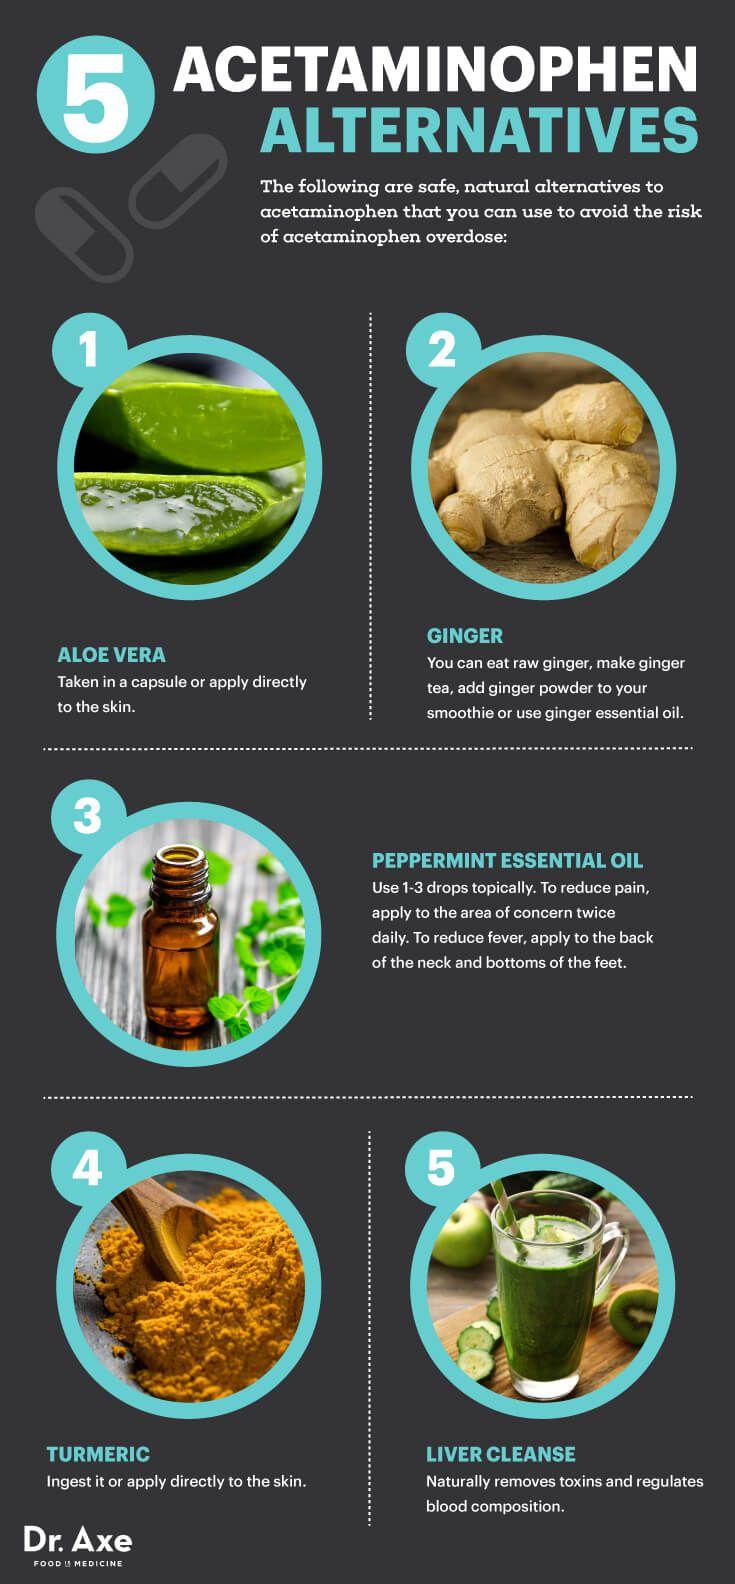 Acetaminophen alternatives - Dr. Axe Peppermint Oil is fabulous alternative!